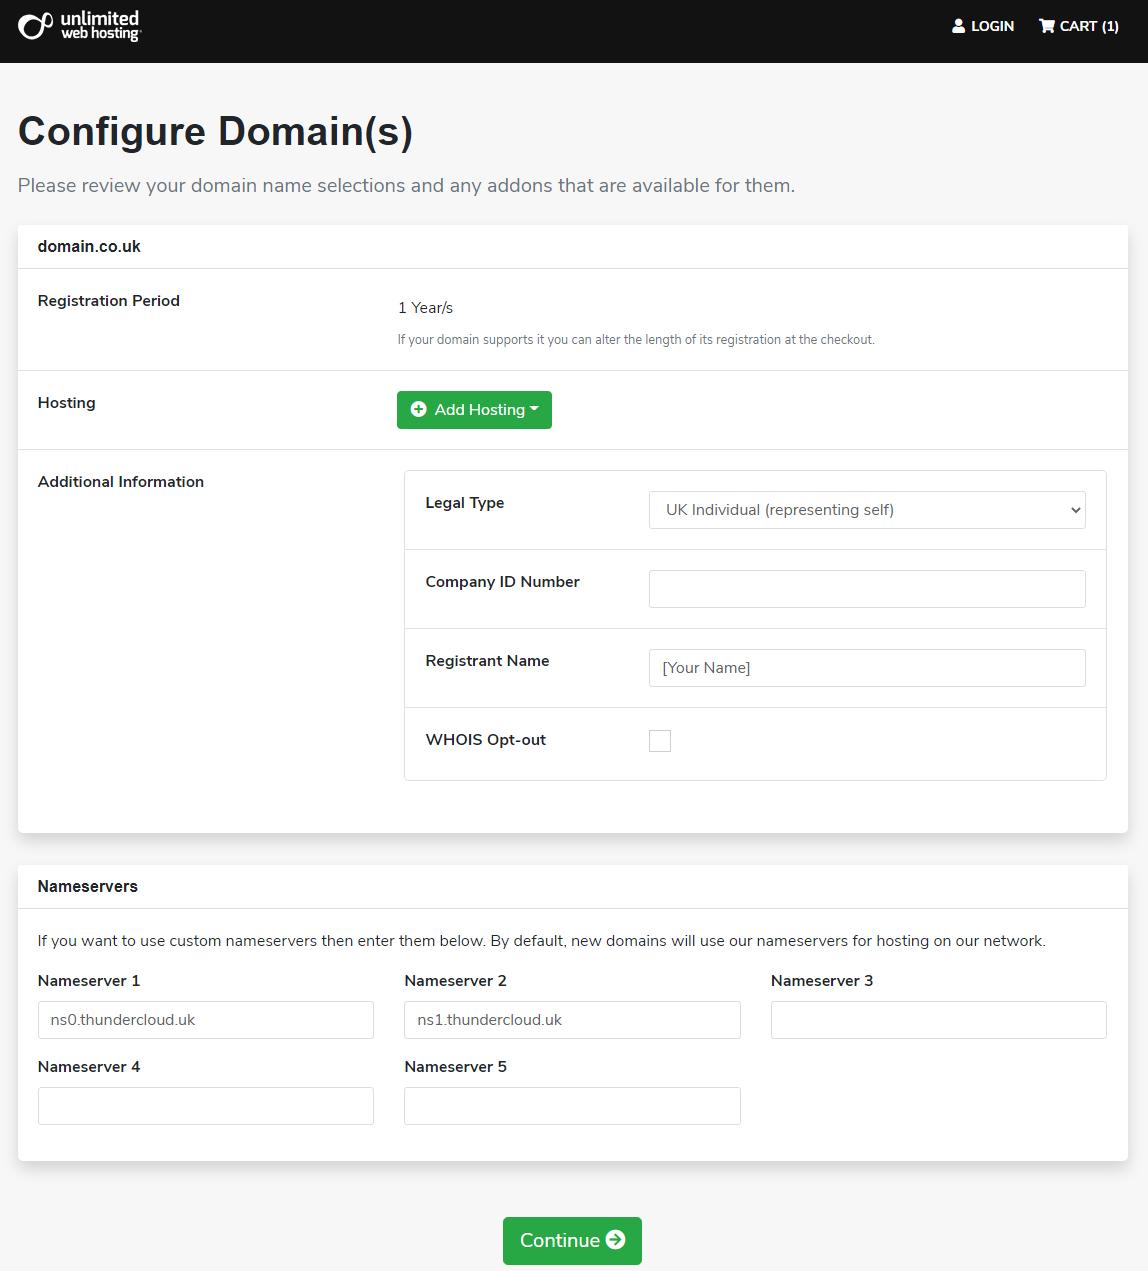 unlimited webhosting domain configuration menu